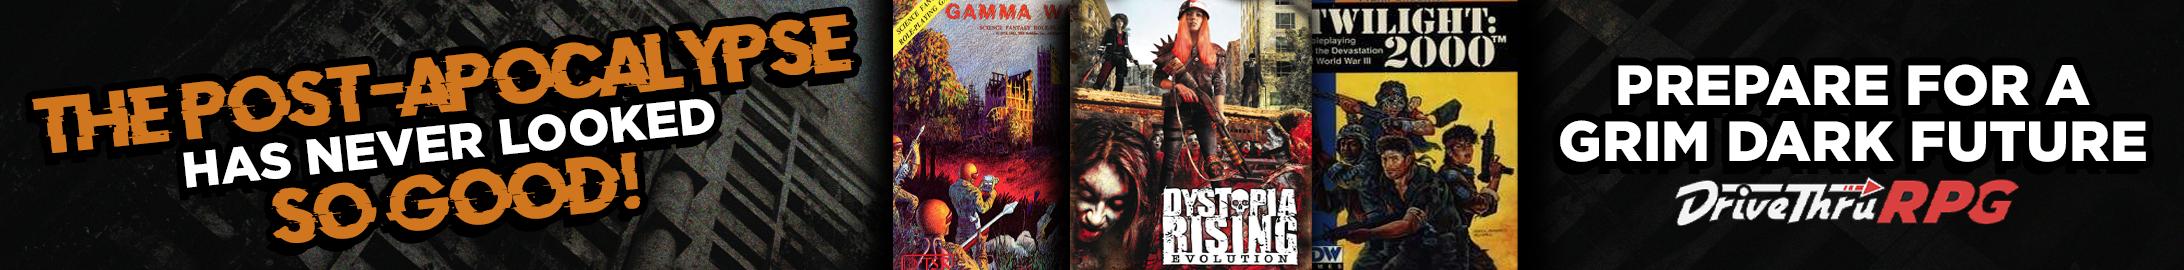 Post-Apocalypse Sale @ DriveThruRPG.com